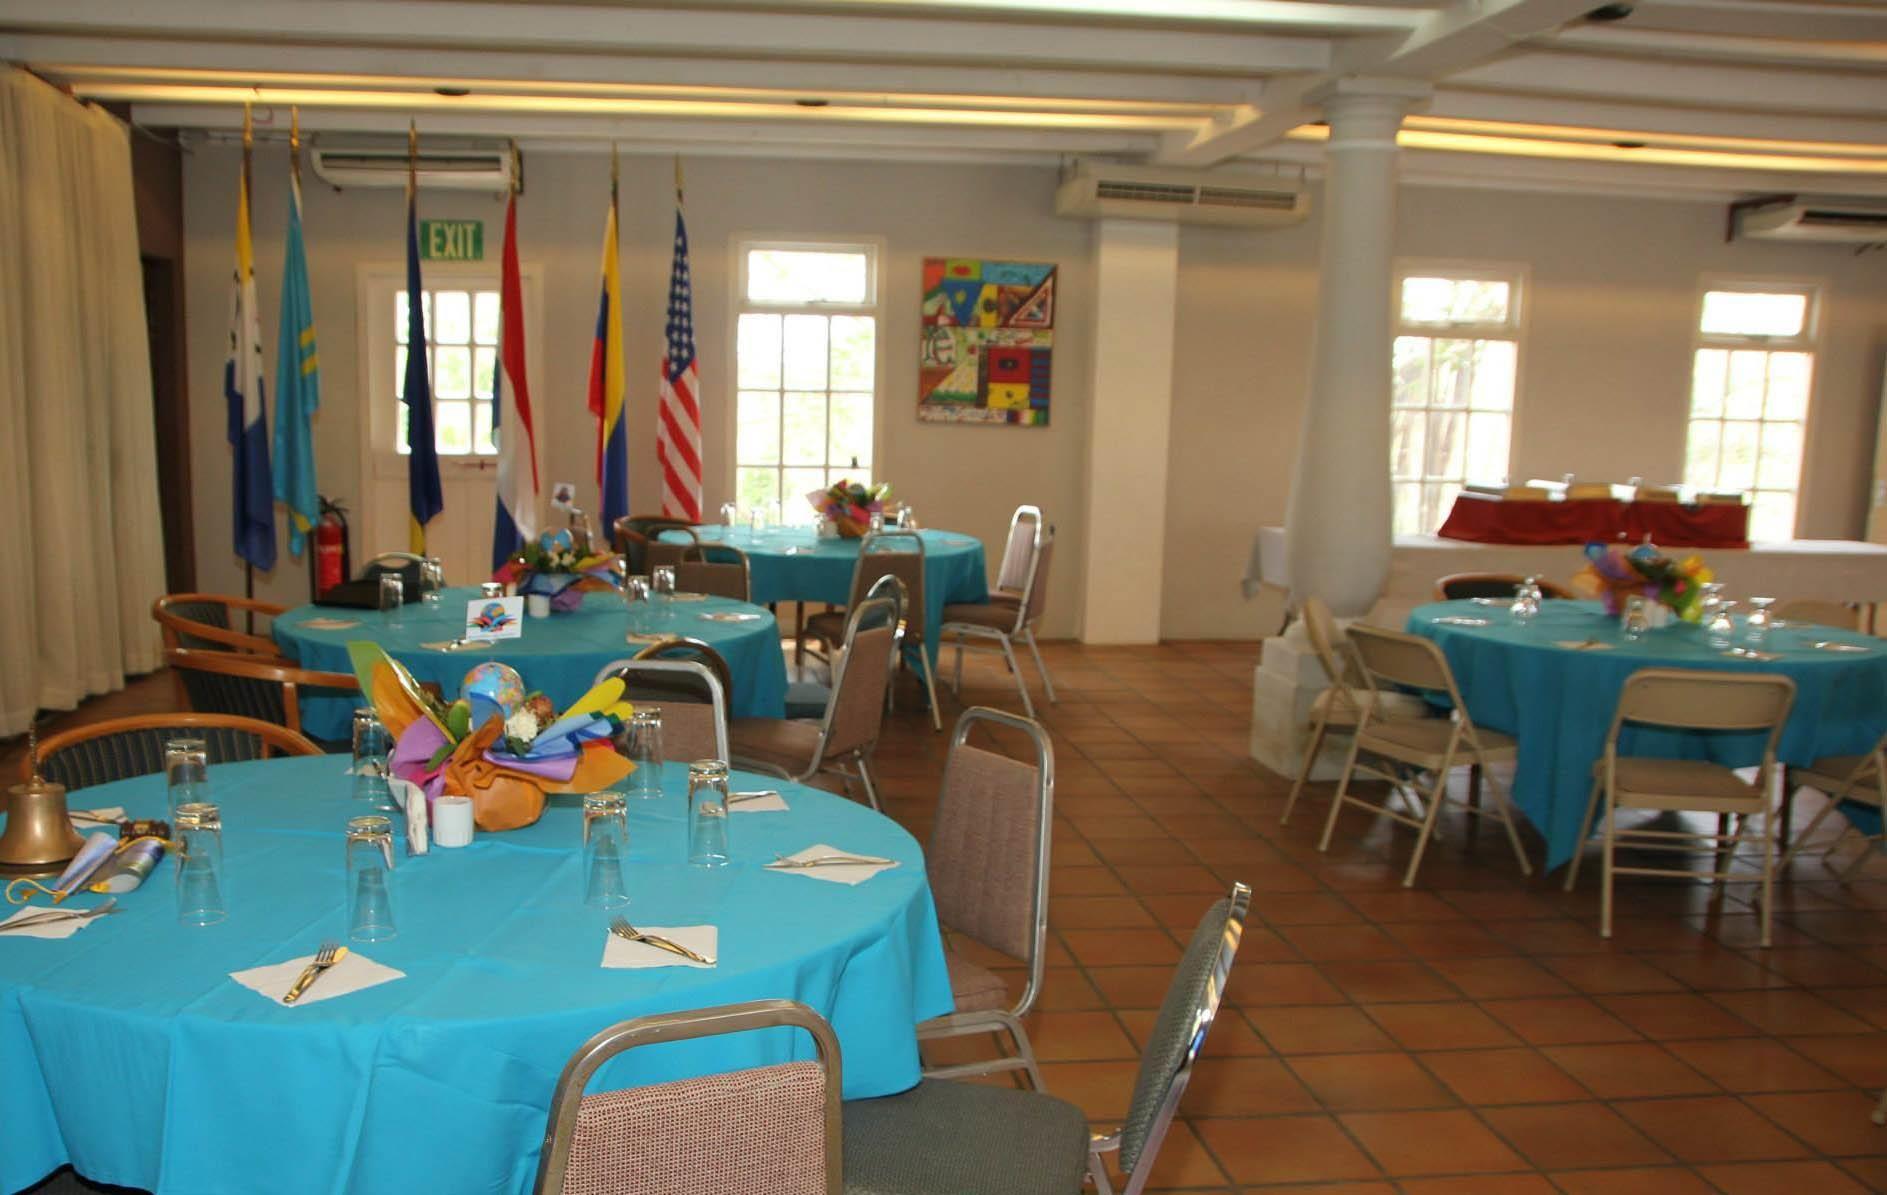 Curacao Rotary Zeelandia Room Curacao Rotary Club Room